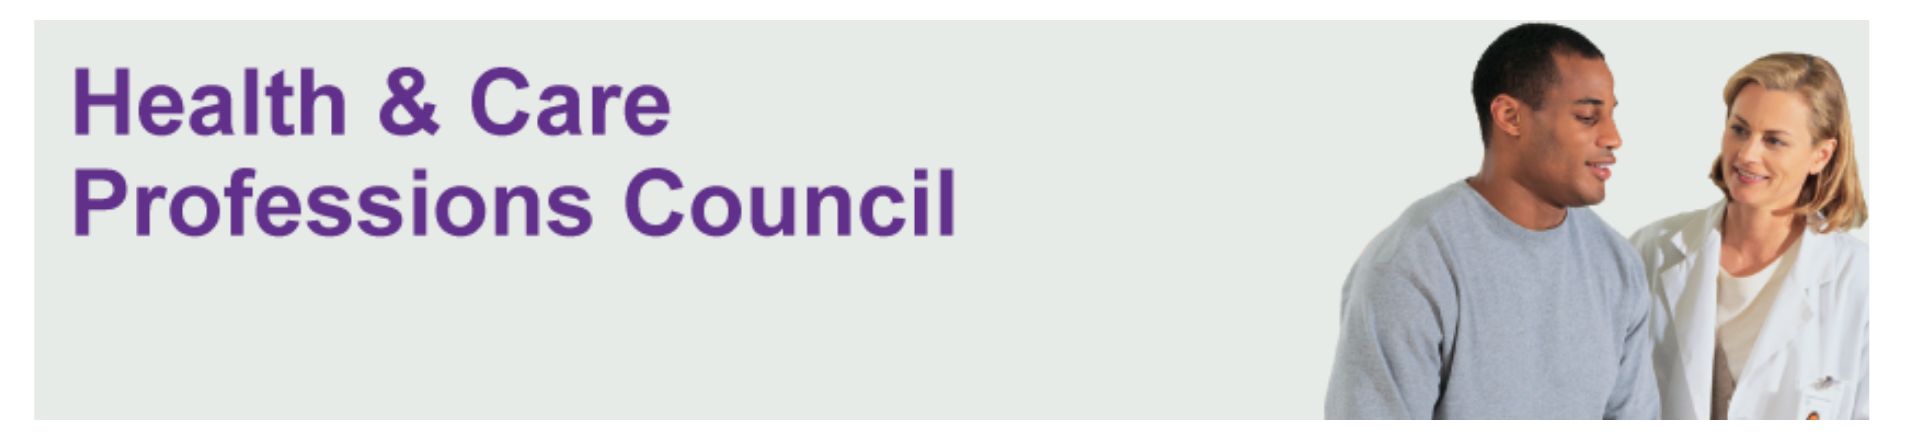 Health Care & Professionals Council